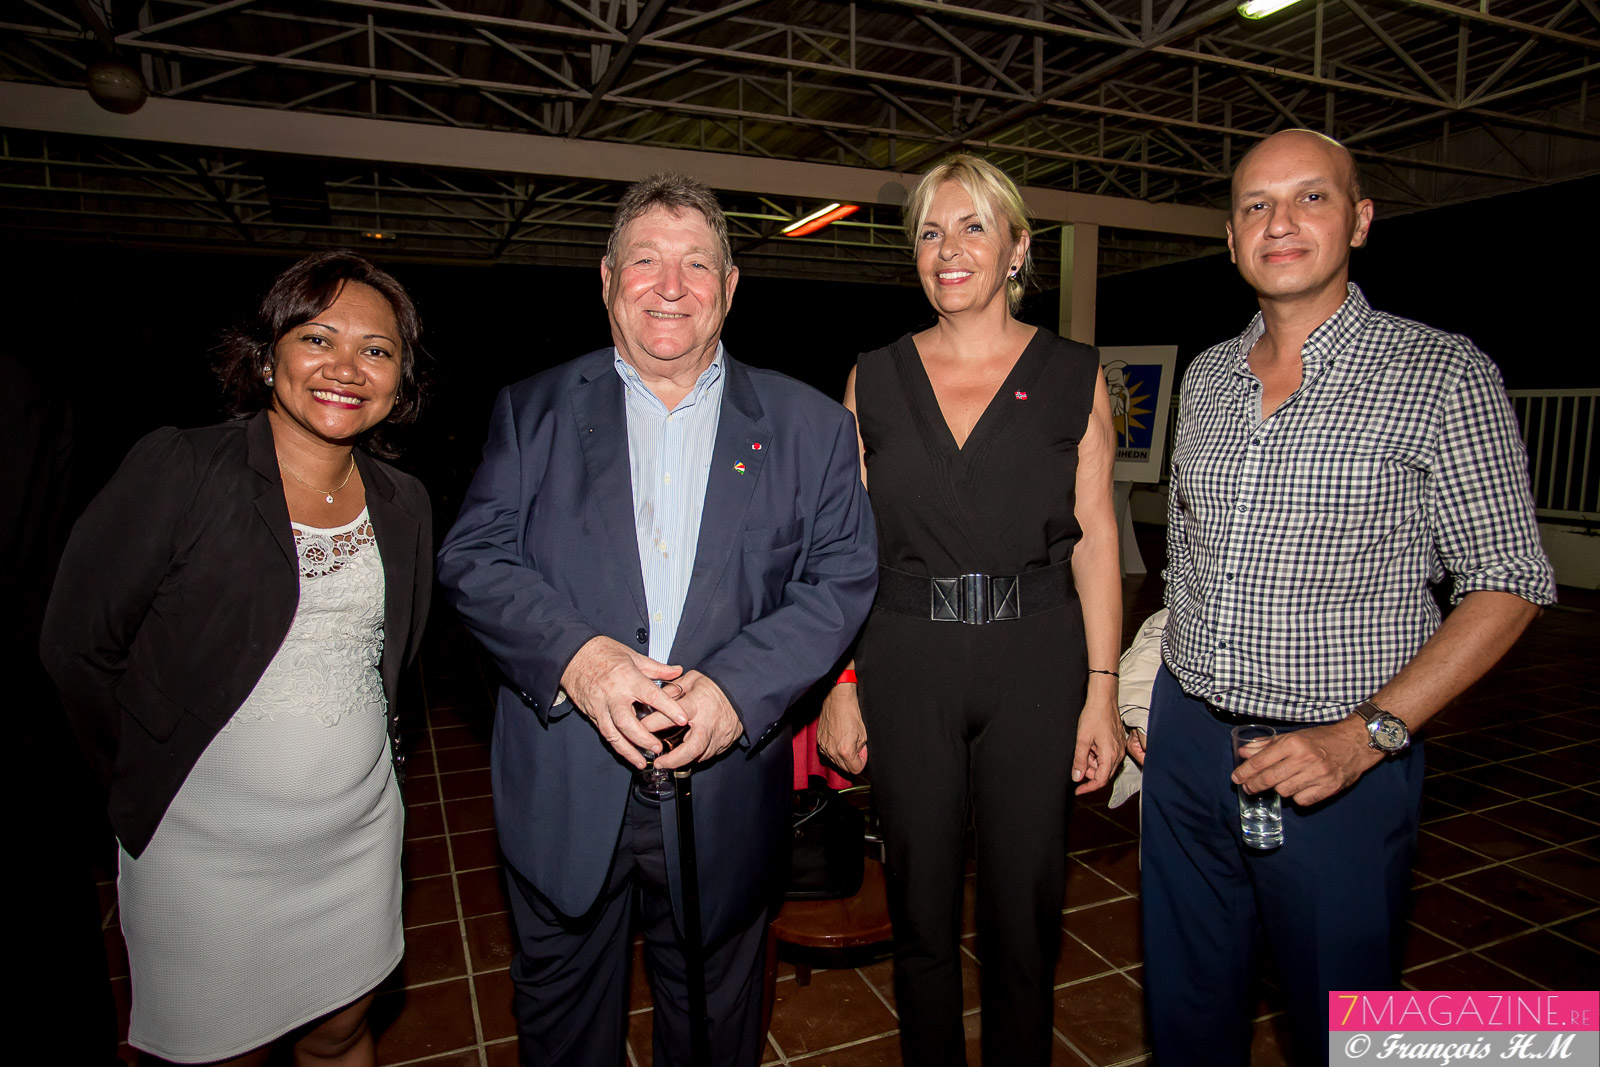 Mialy Andrianaivo, Jean-Claude Pech, consul honoraire des Seychelles, Eve Lyne Charlanes, et Hugues Maillot, cadre au Conseil Départemental